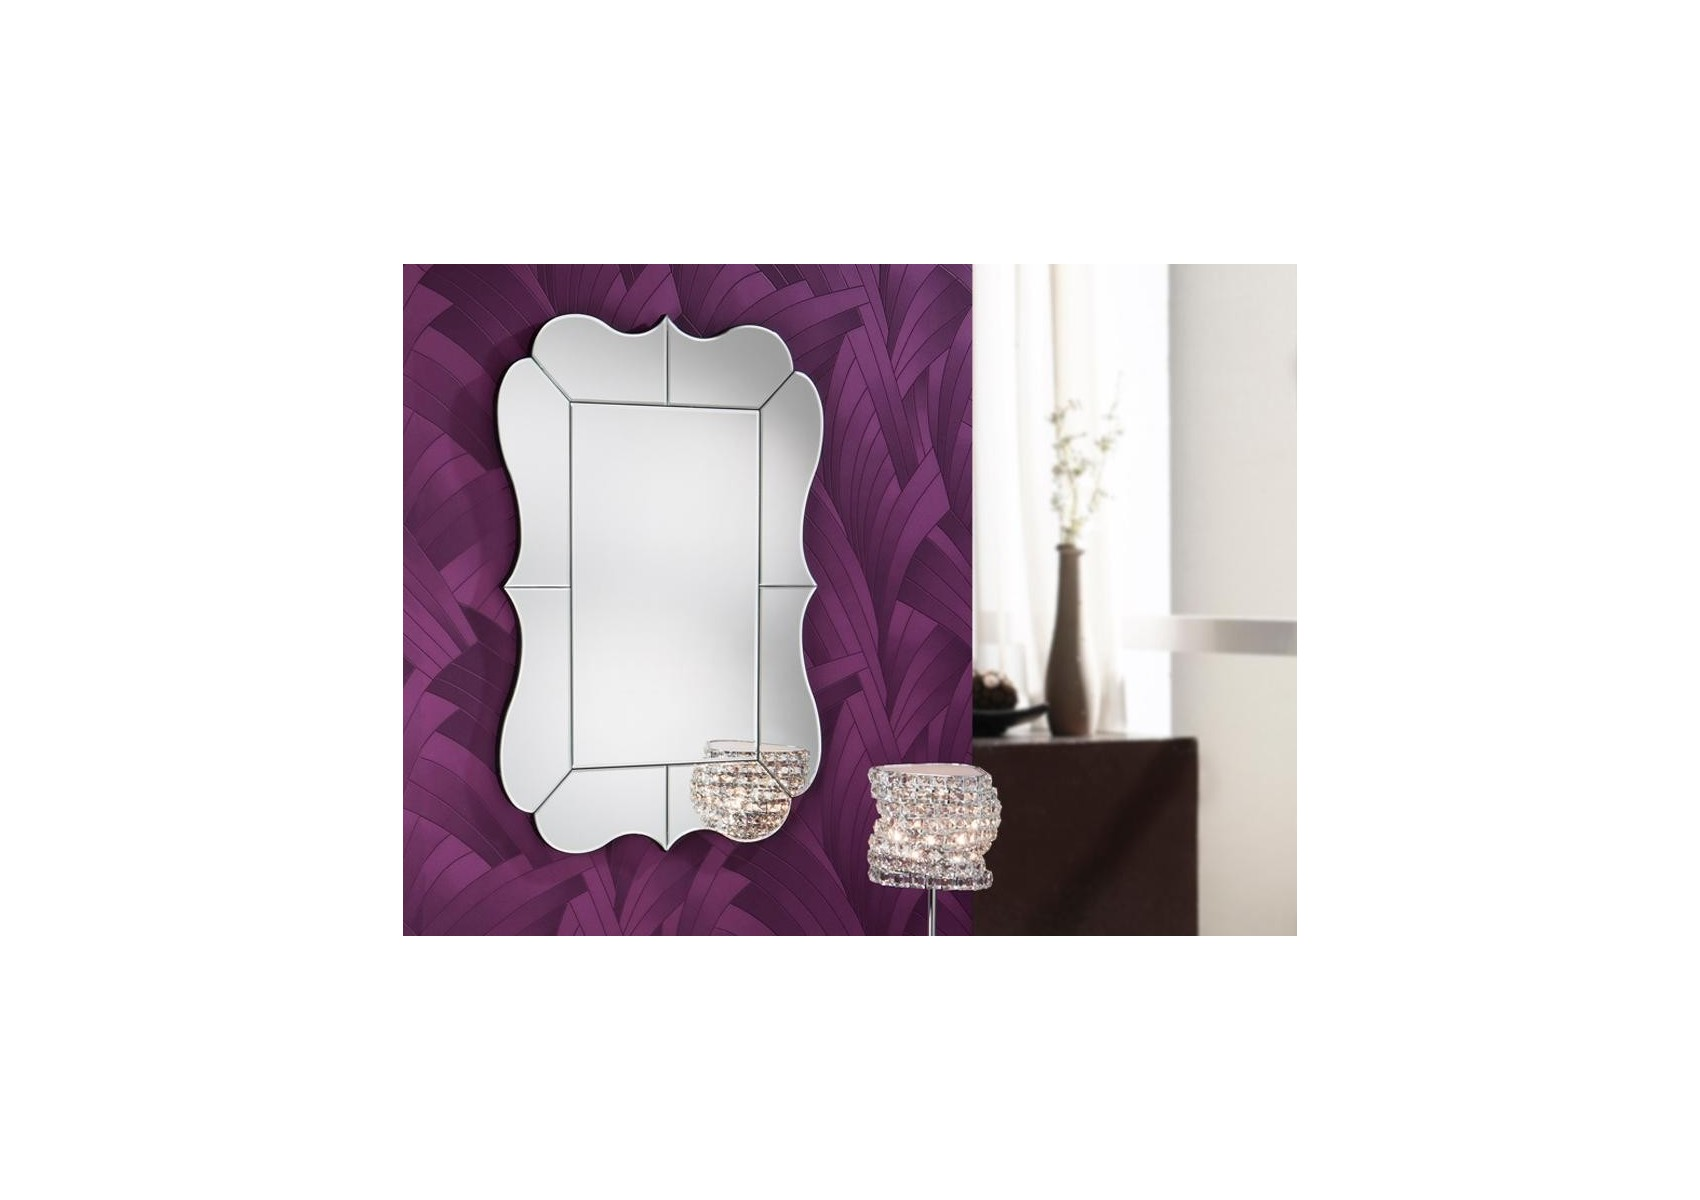 Miroir original design CELIA RECTANGULAIRE - deco schuller